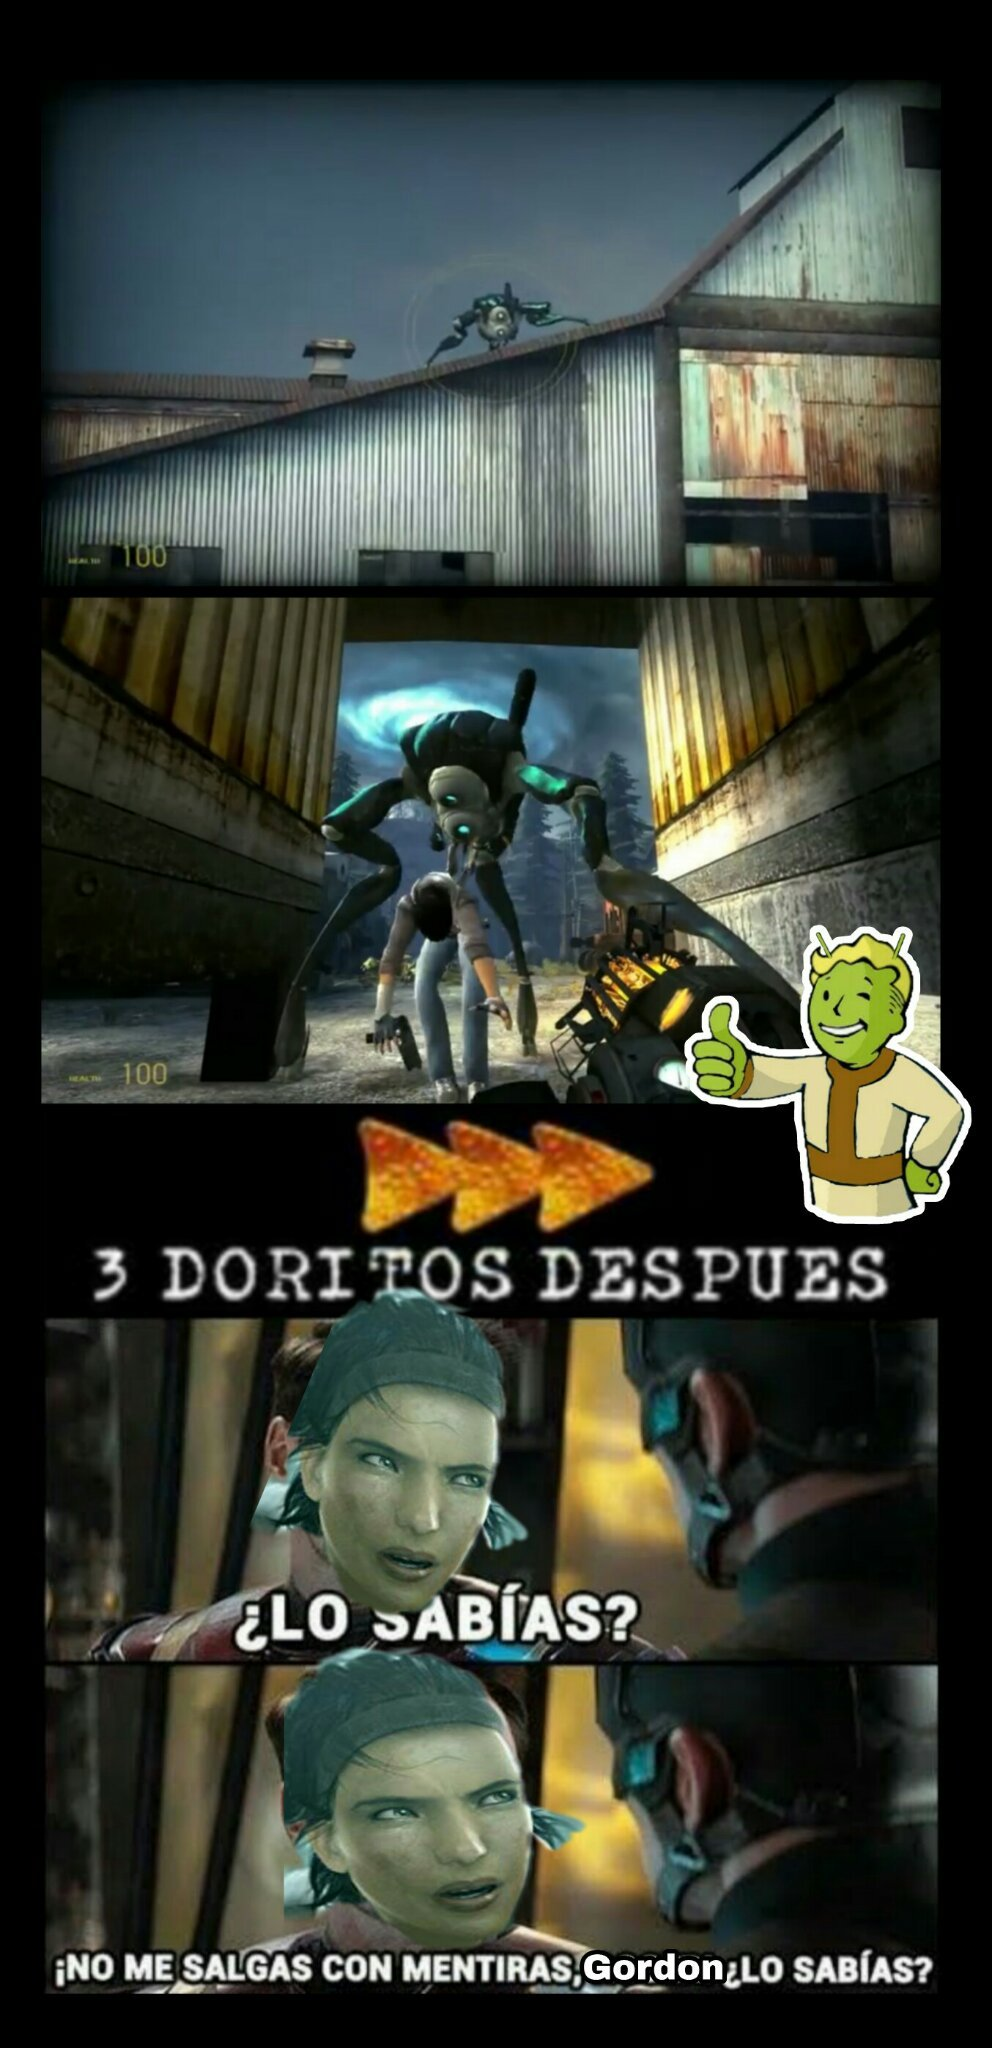 Half Life 2 Episodio 2 Juegazo Meme By The Master Pro Memedroid